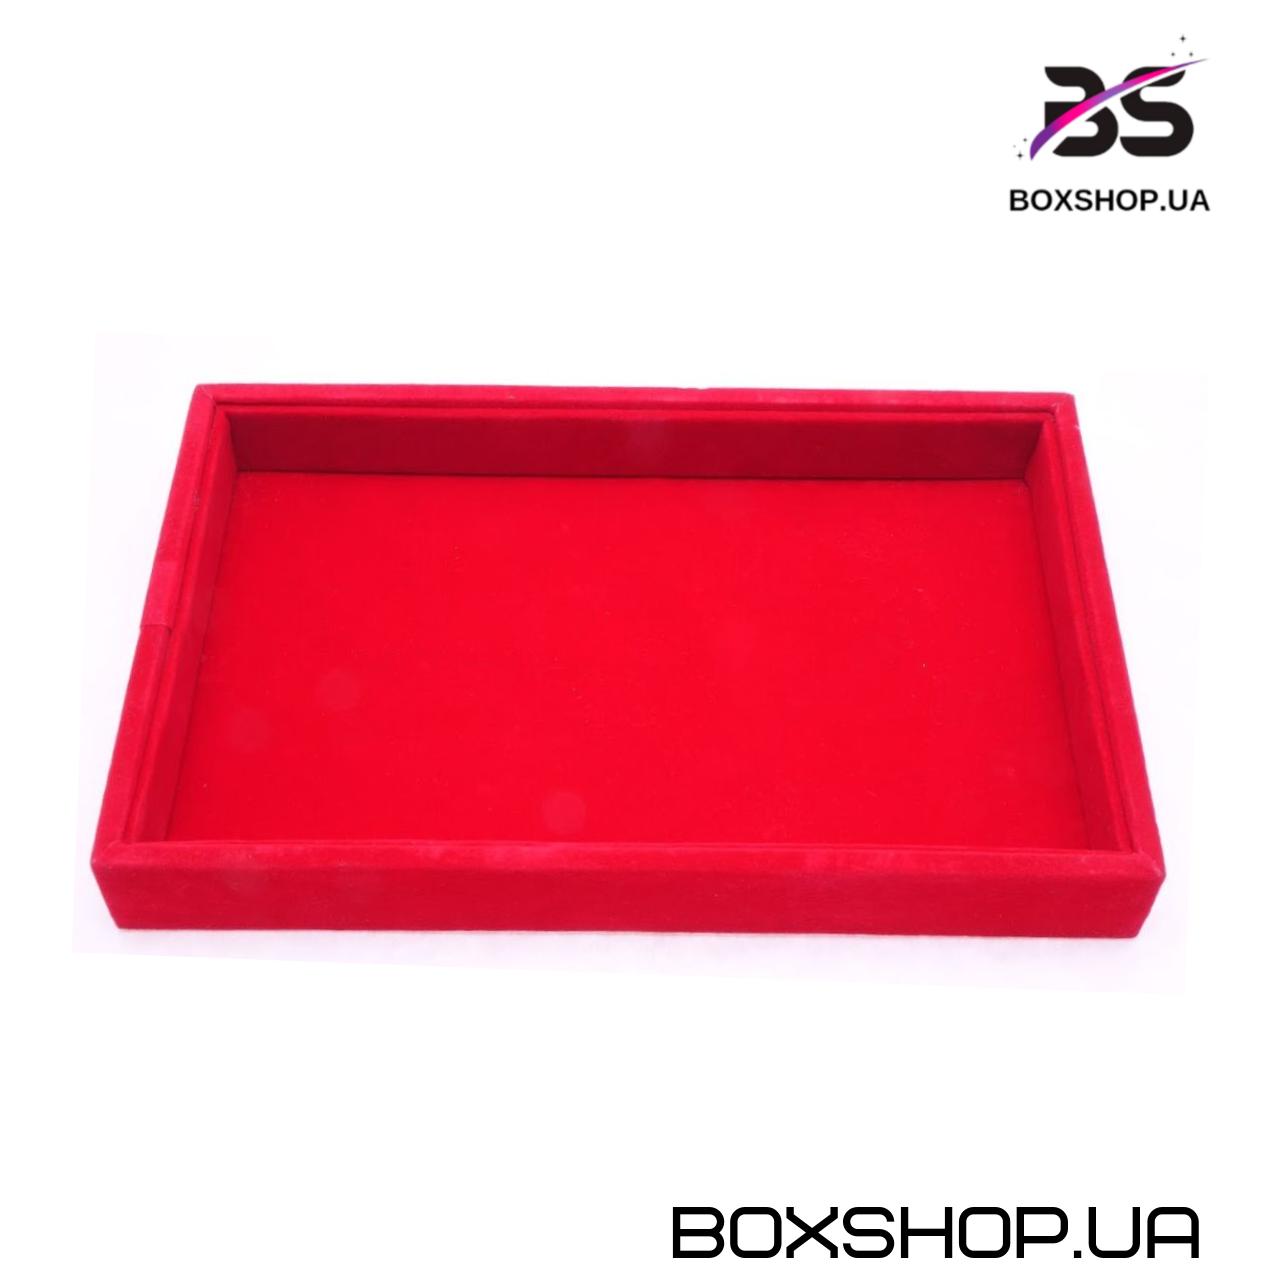 Ювелирный планшет-презентер BOXSHOP - 1022864677